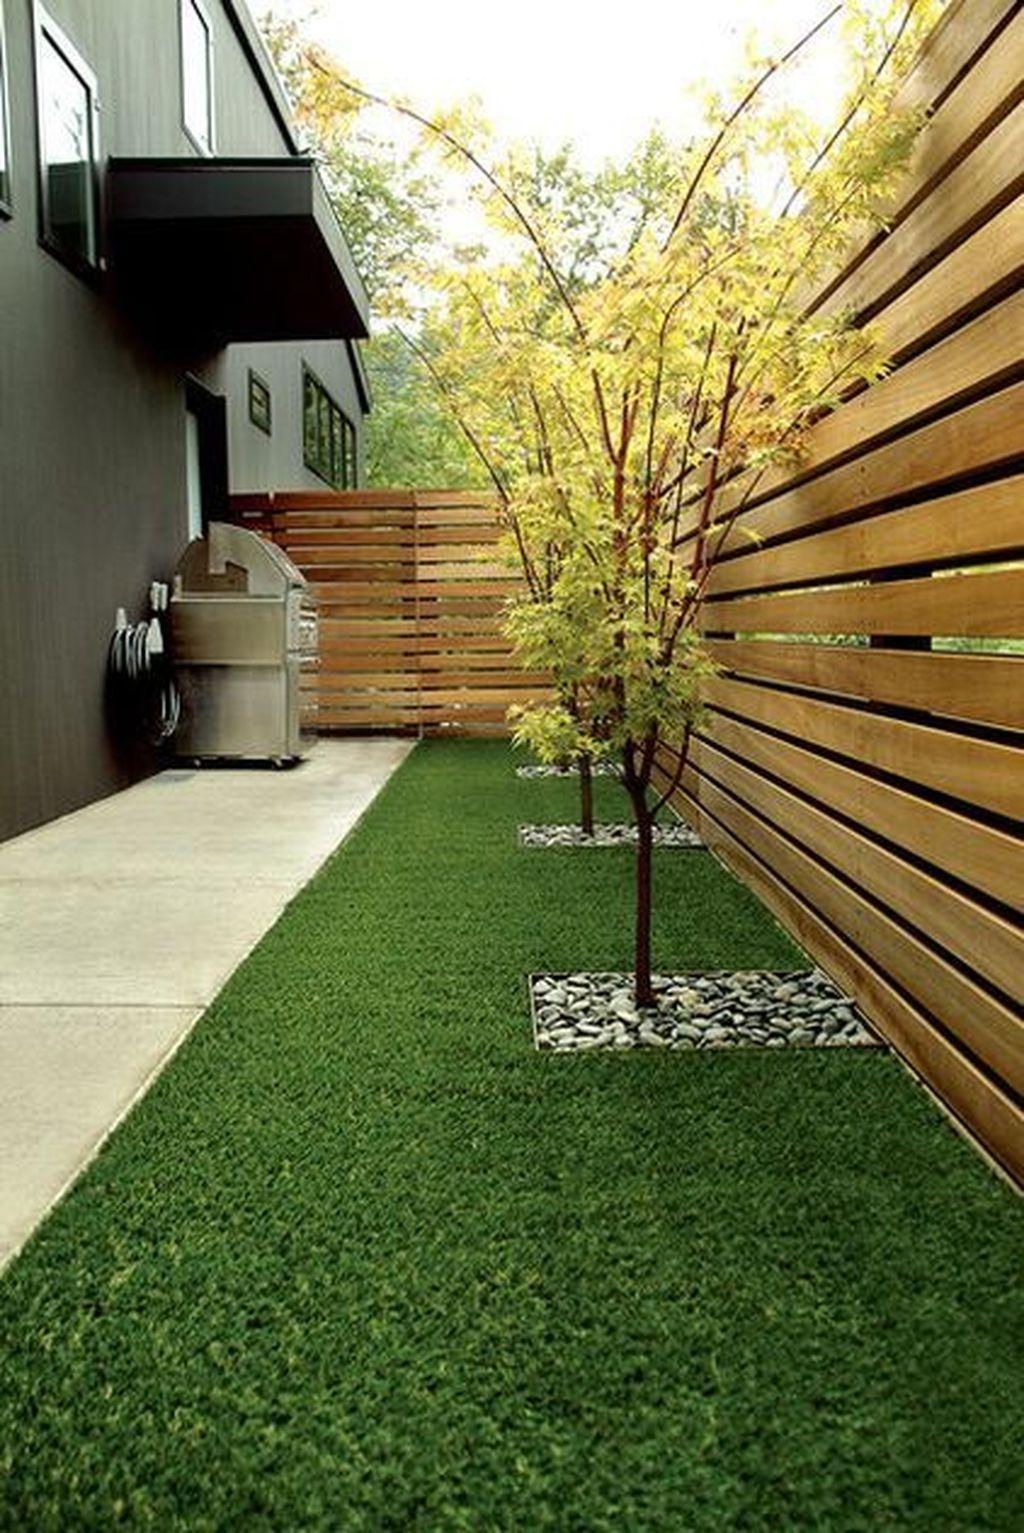 42 Brilliant Small Backyard Design Ideas On A Budget Pimphomee